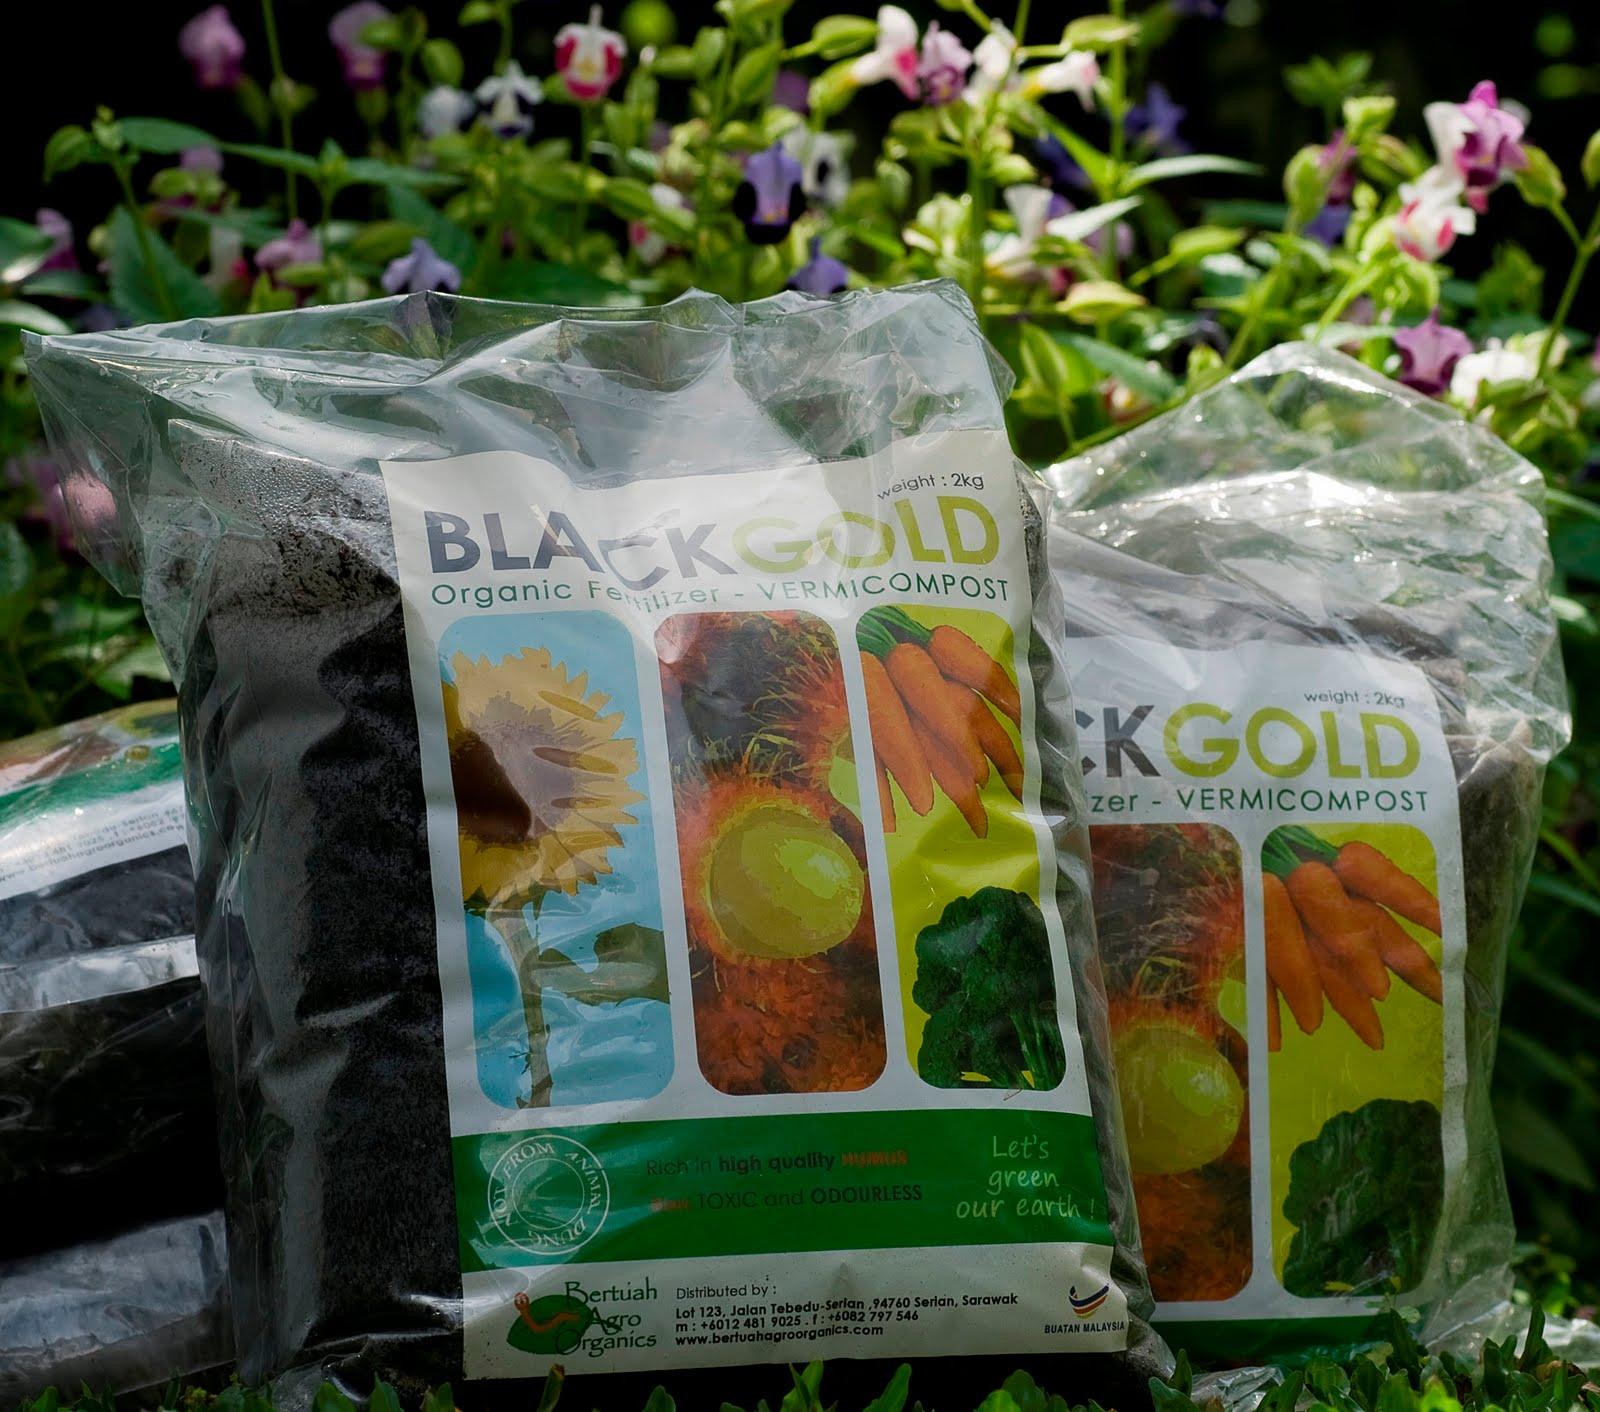 Bertuah Agro Organics: 100% Vermicompost - Best Natural